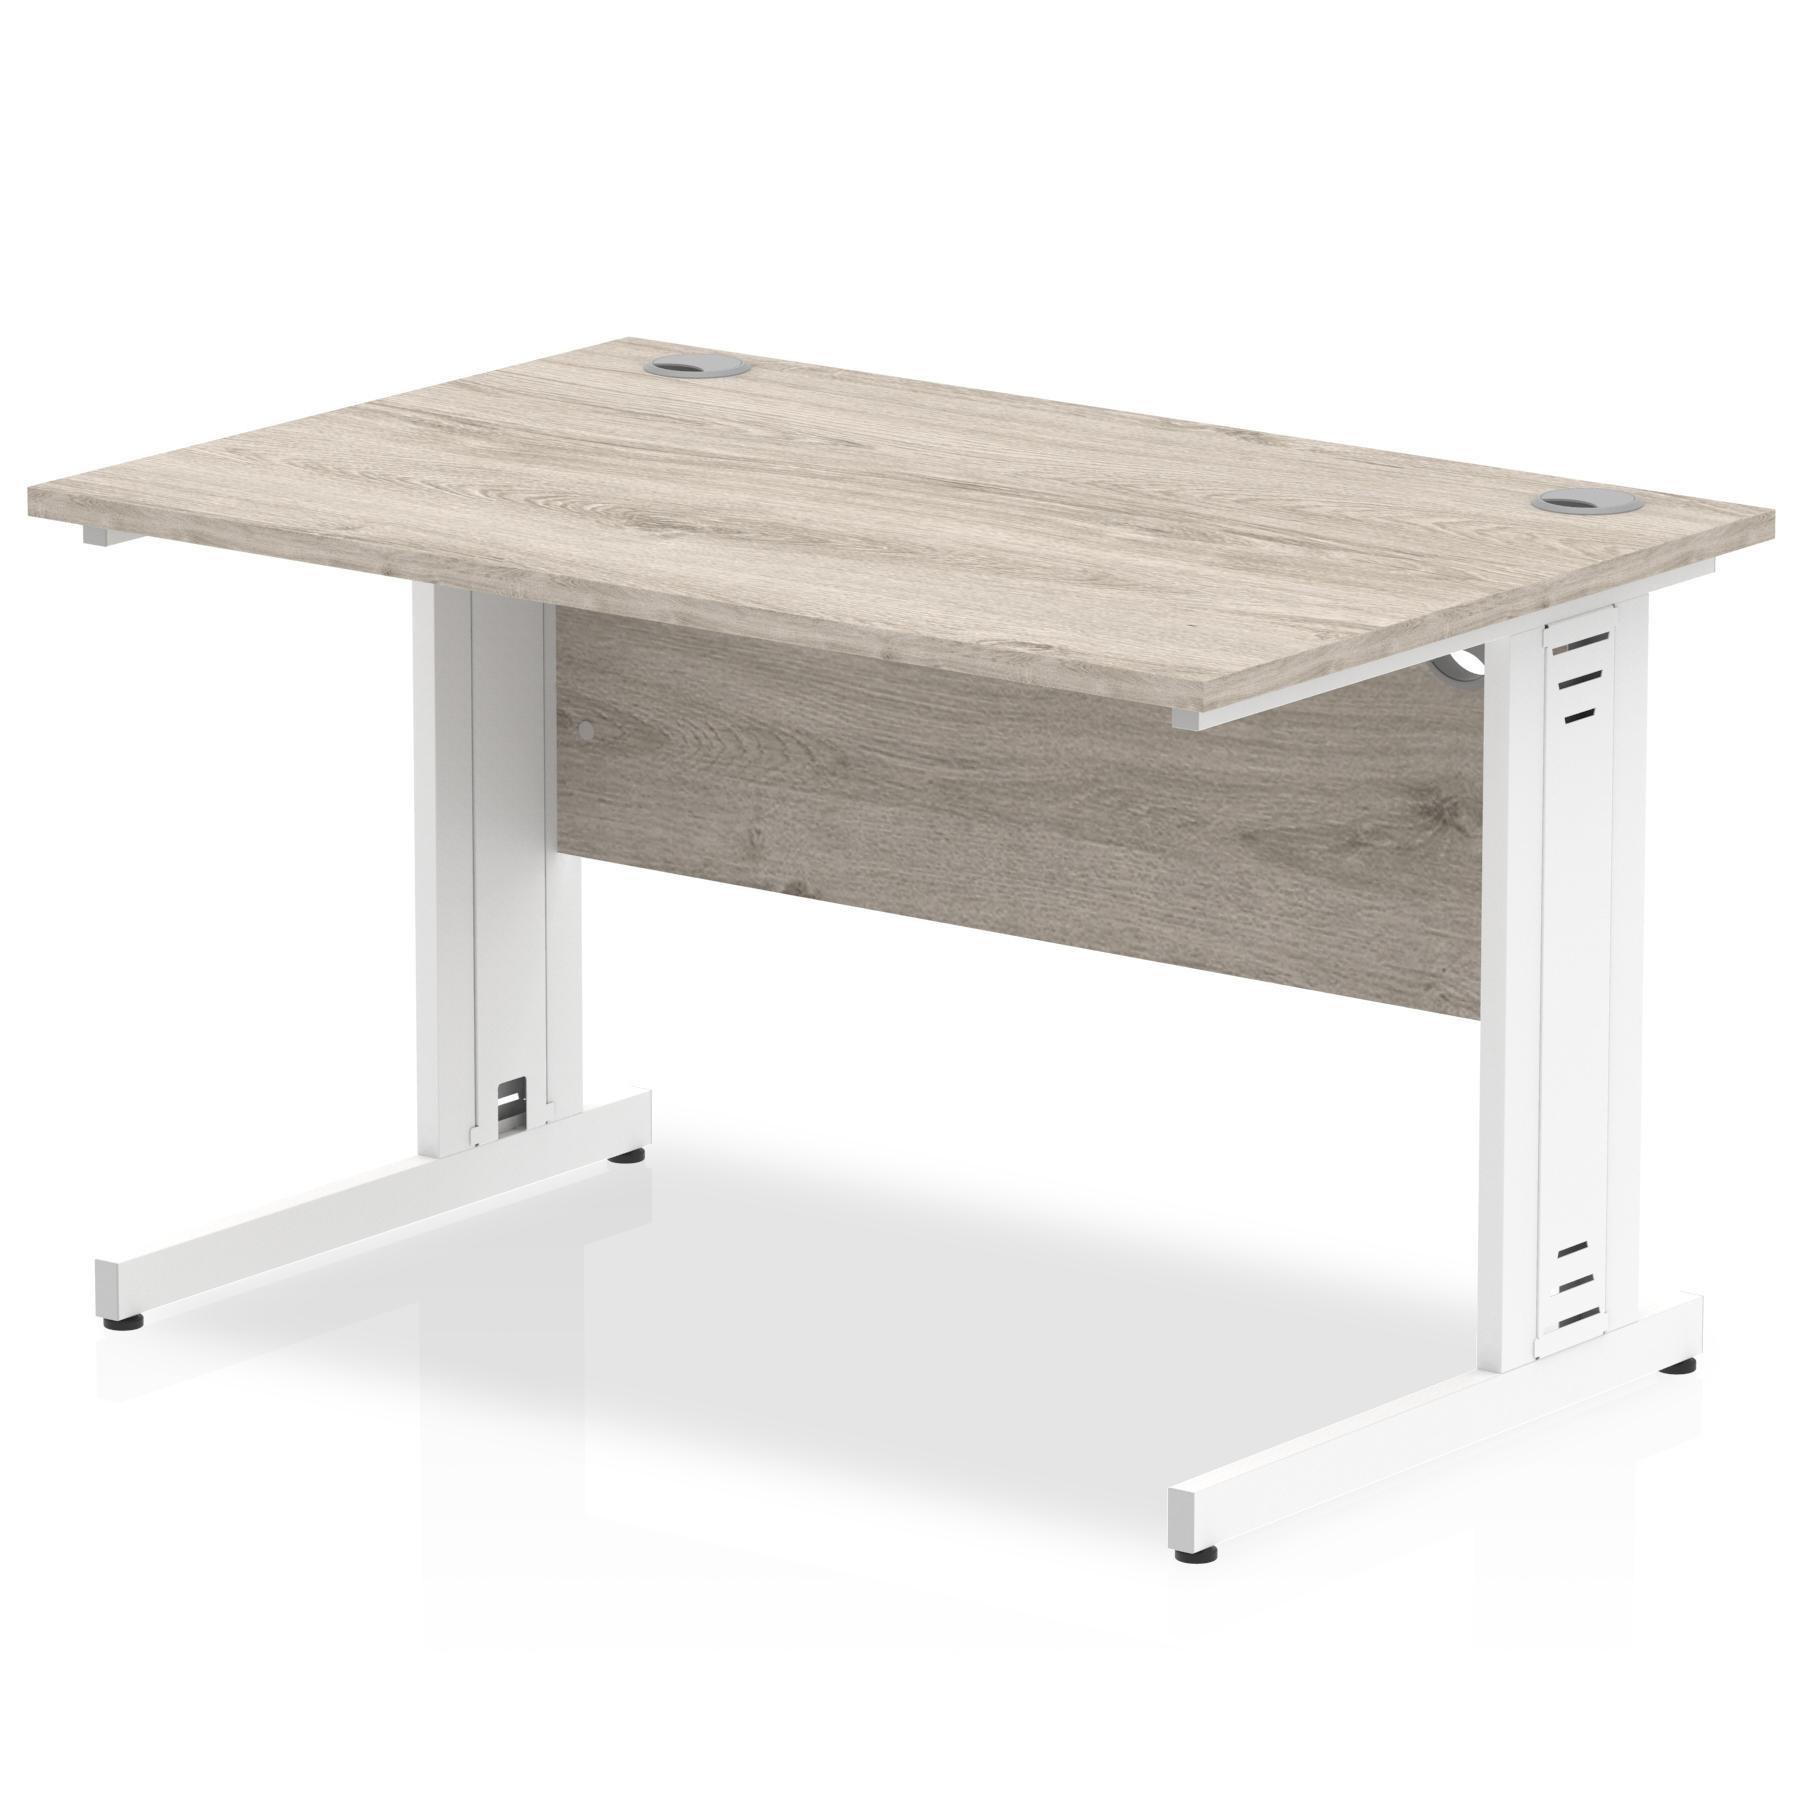 Trexus Rectangular Desk White Cable Managed Leg 1000x800mm Grey Oak Ref I003097